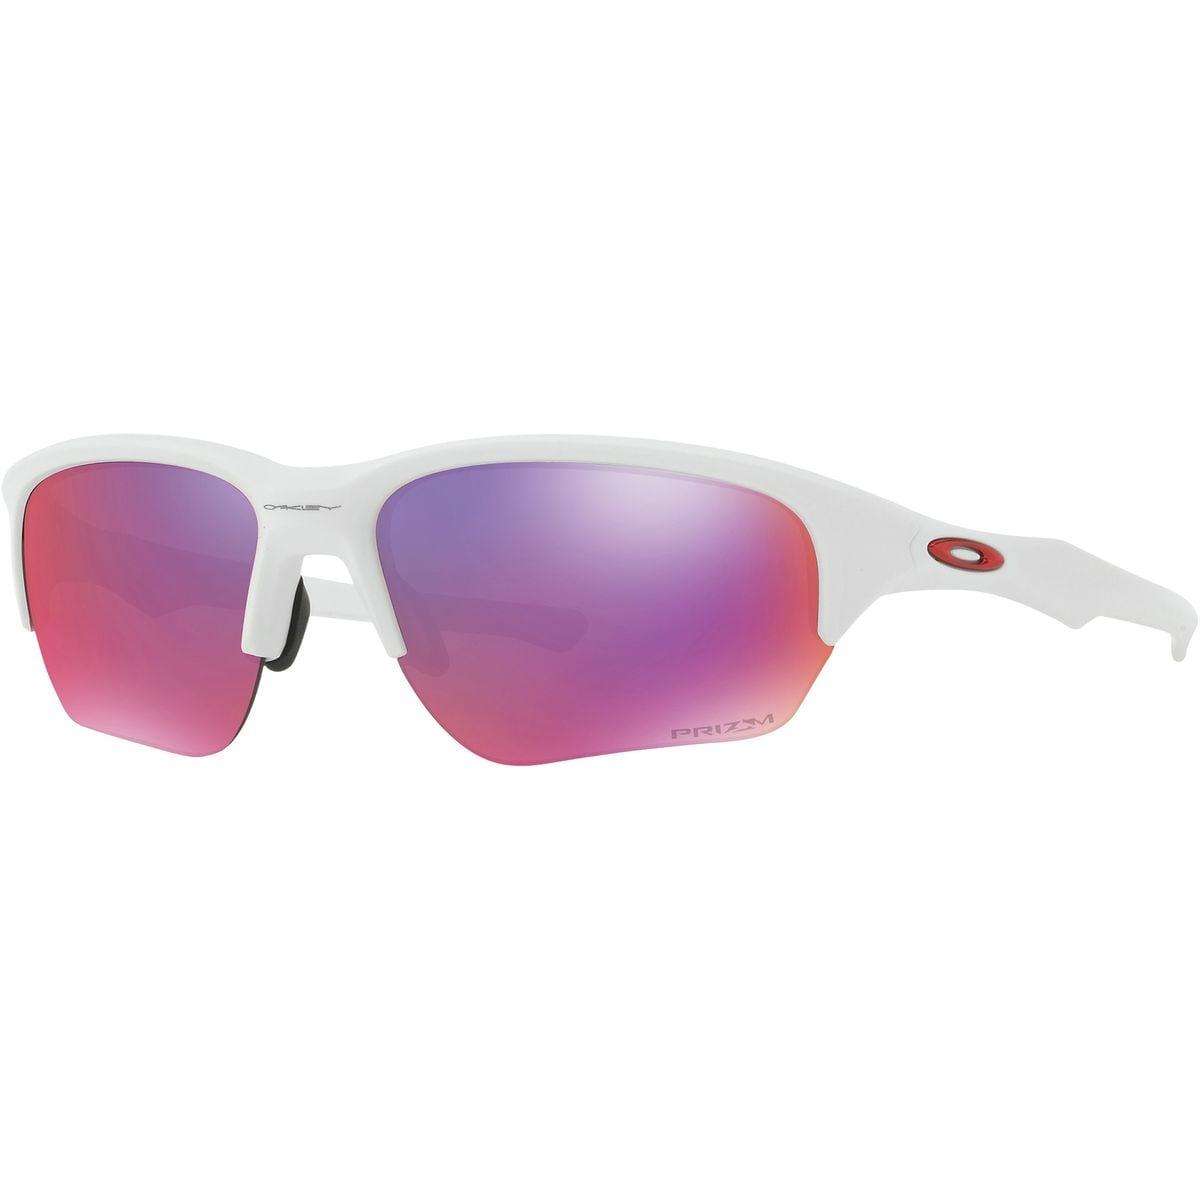 oakley prizm sunglasses womens